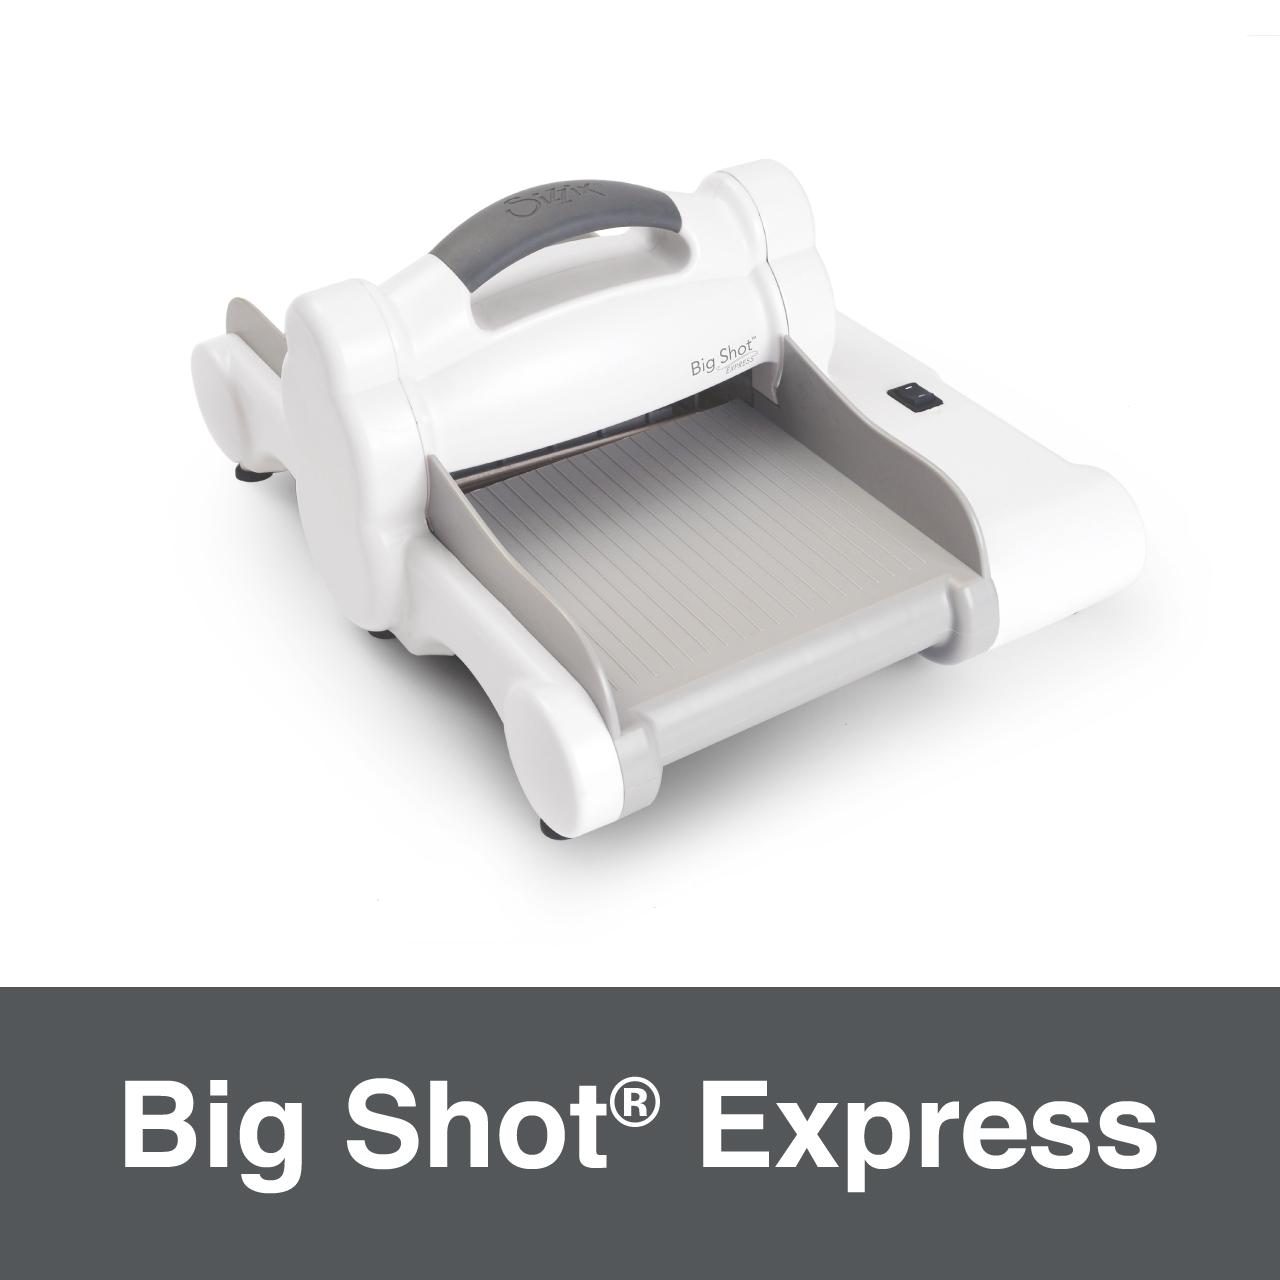 Big Shot Express